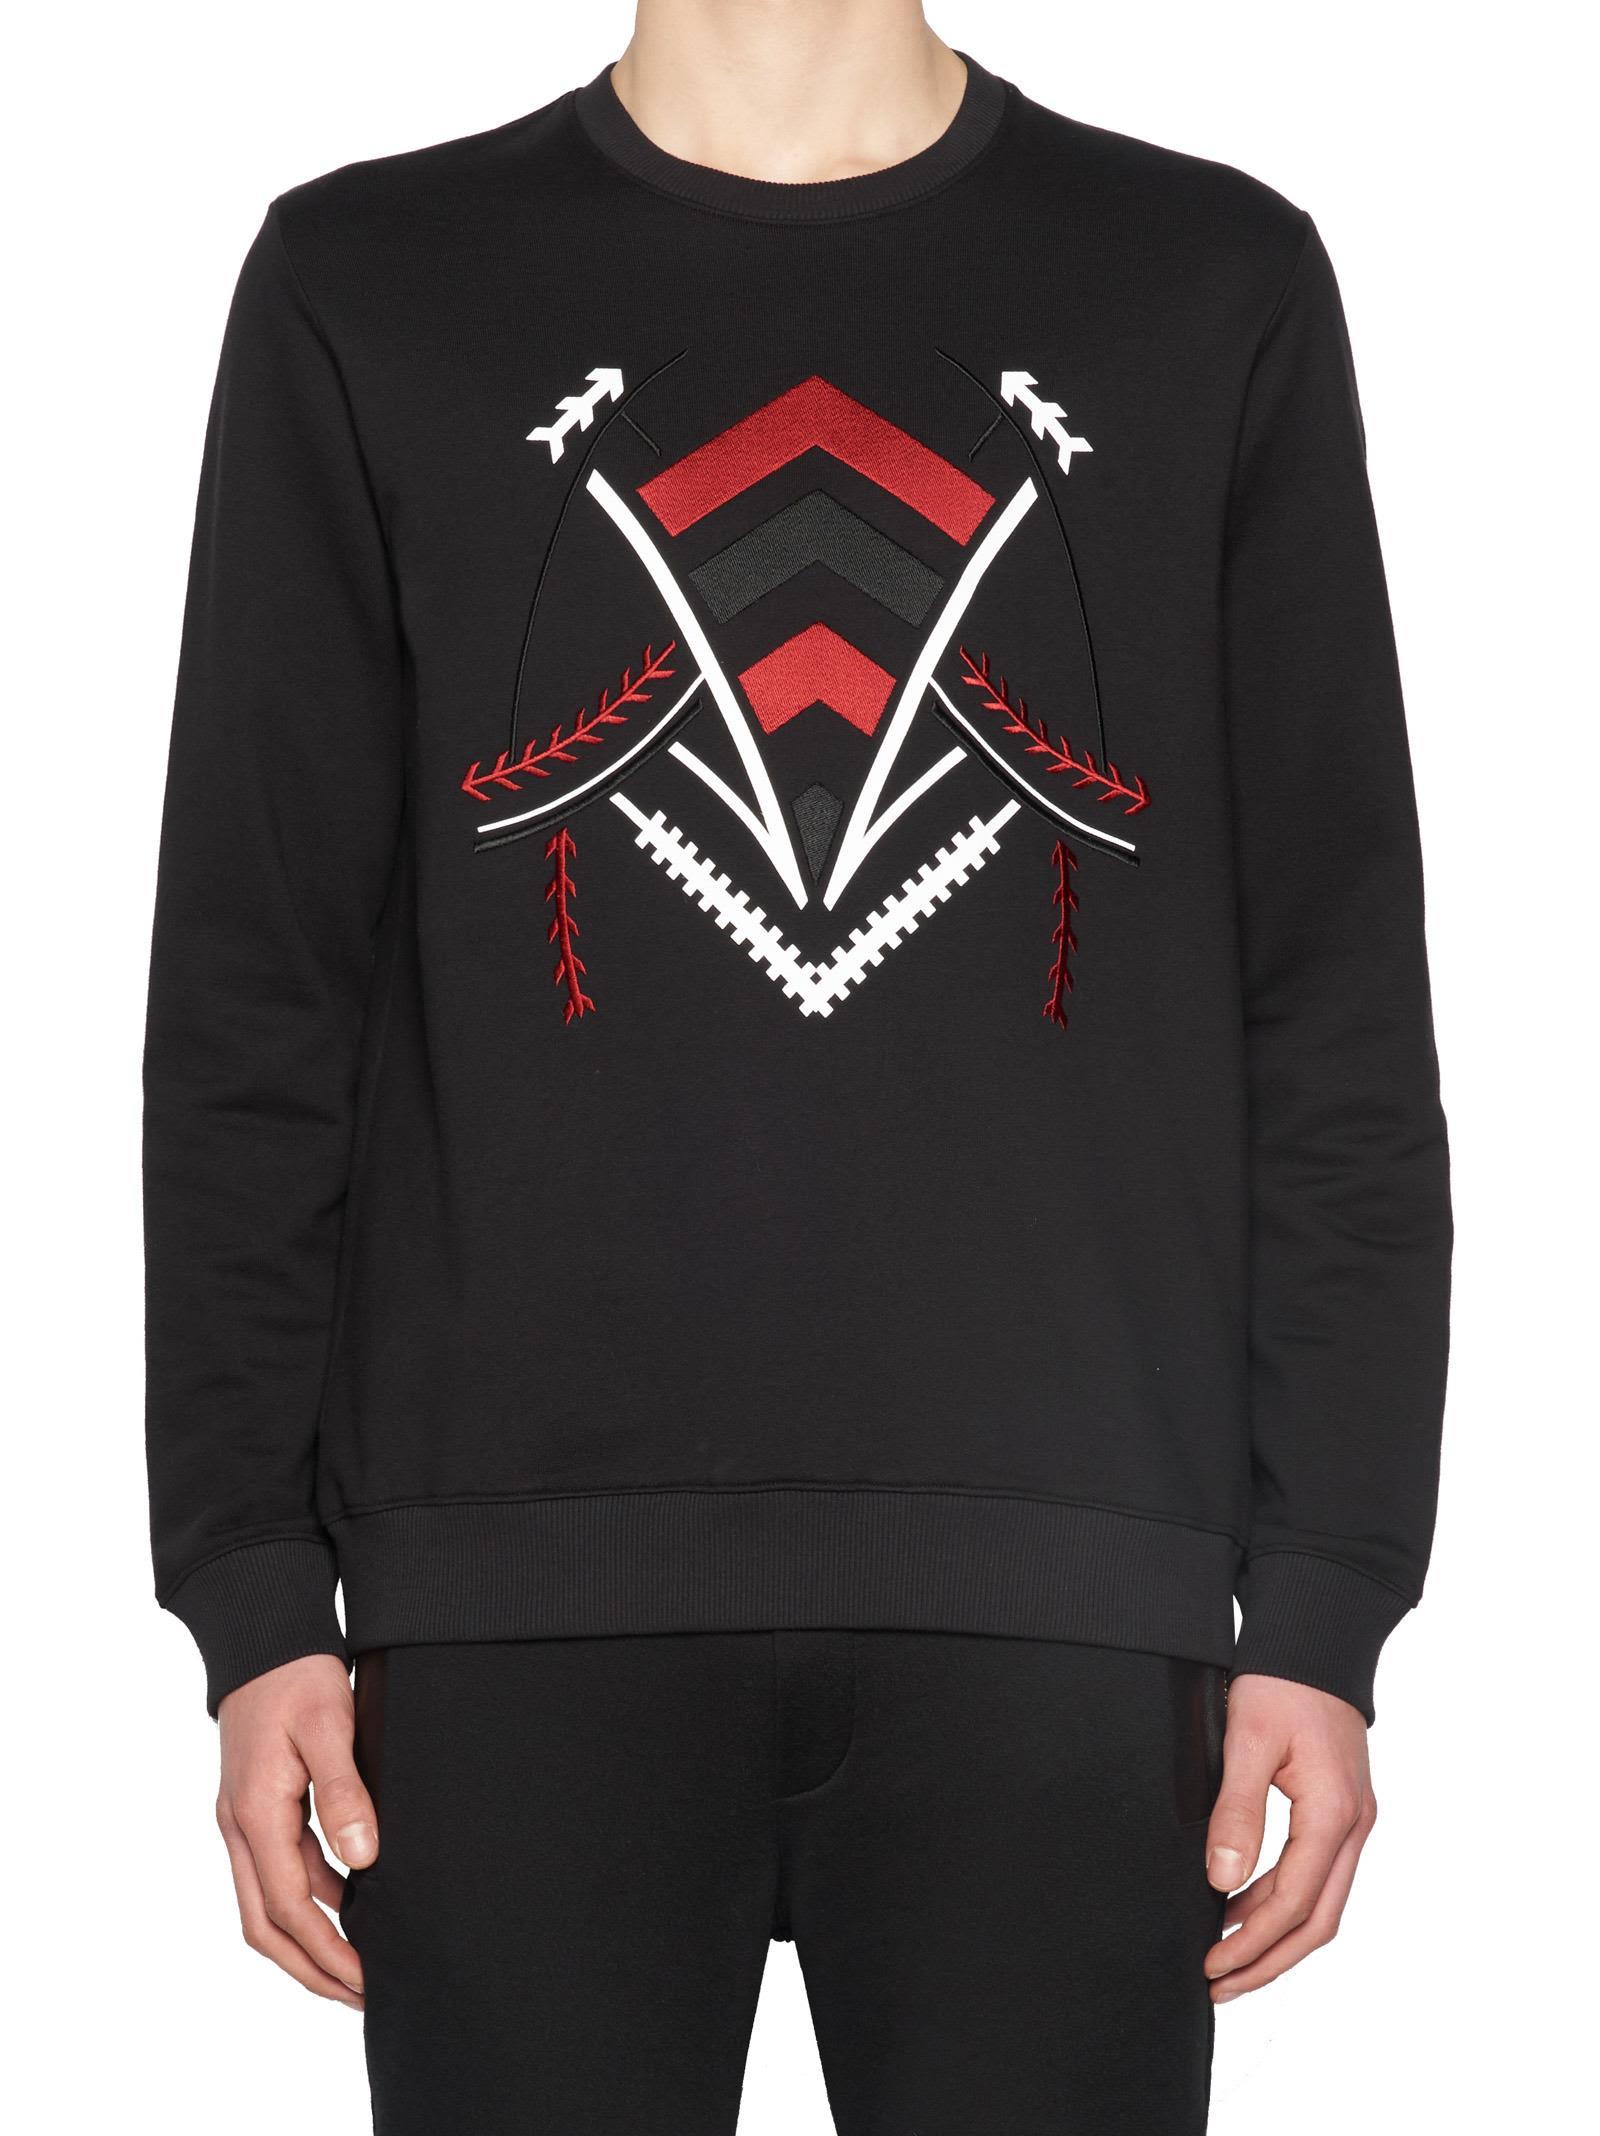 Les Hommes 'tribal' Sweatshirt